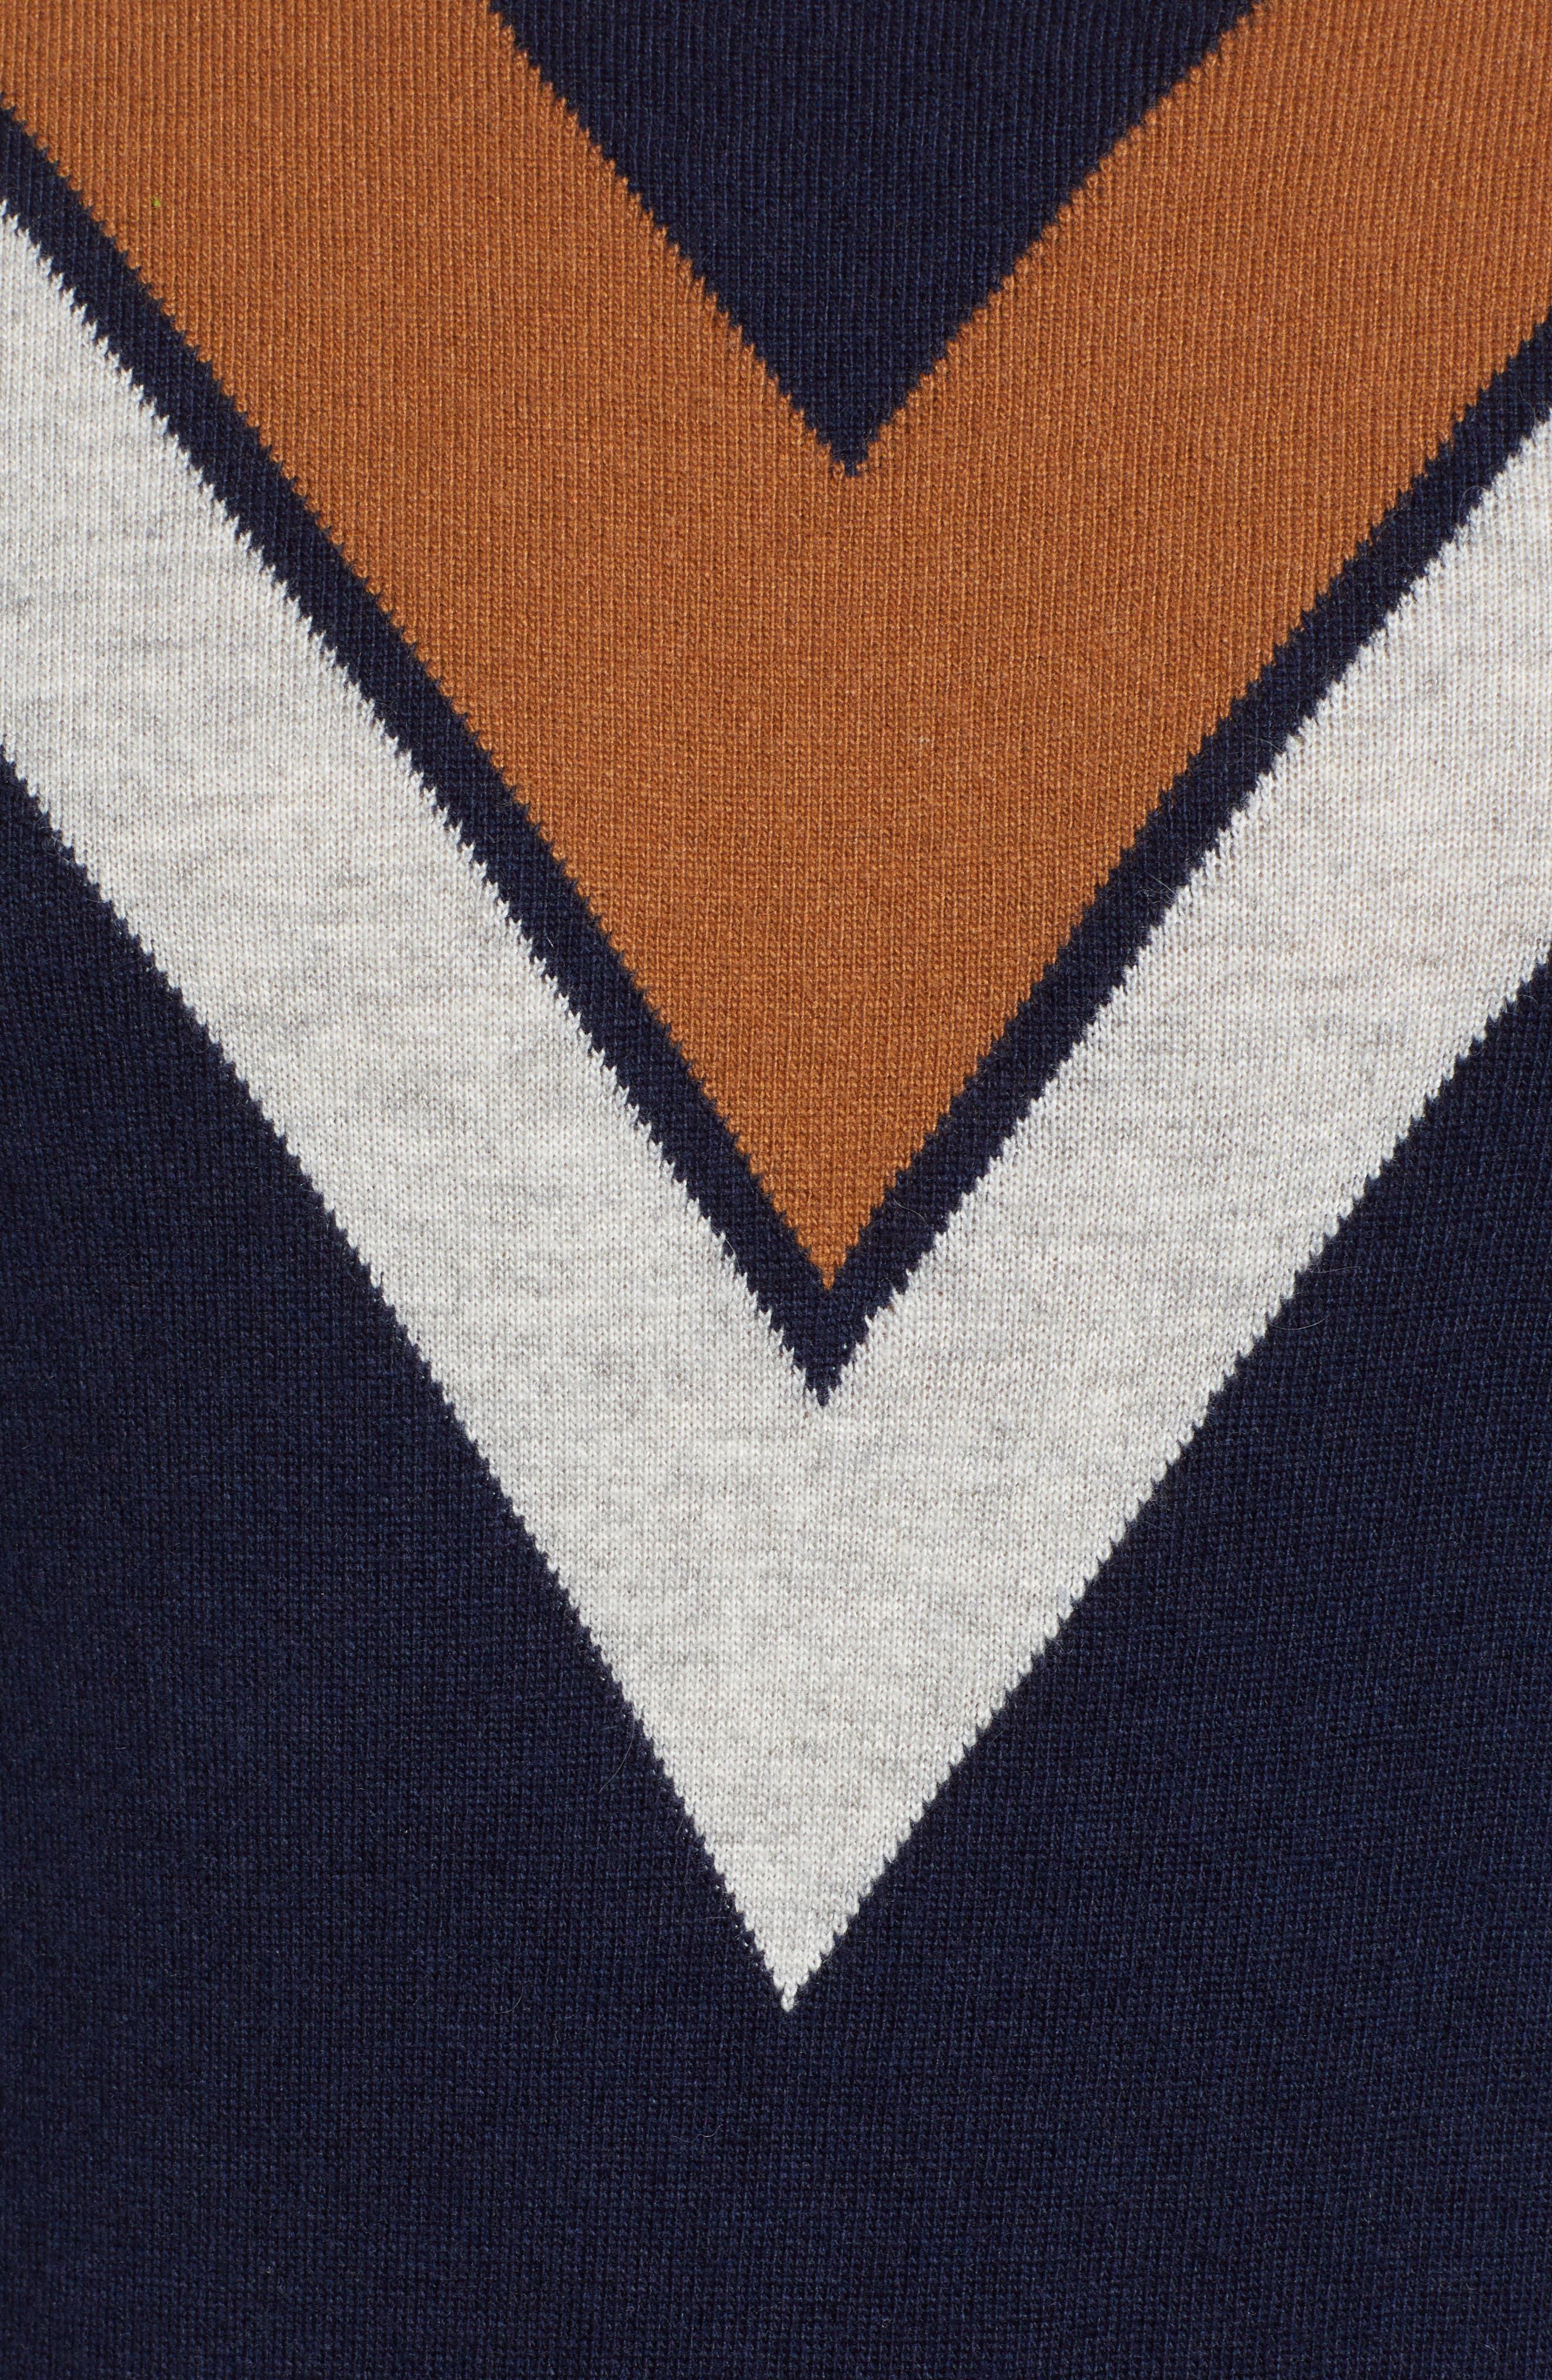 Minton V Crewneck Sweater,                             Alternate thumbnail 5, color,                             DARK NAVY/ LHN/ BURNT SUGAR